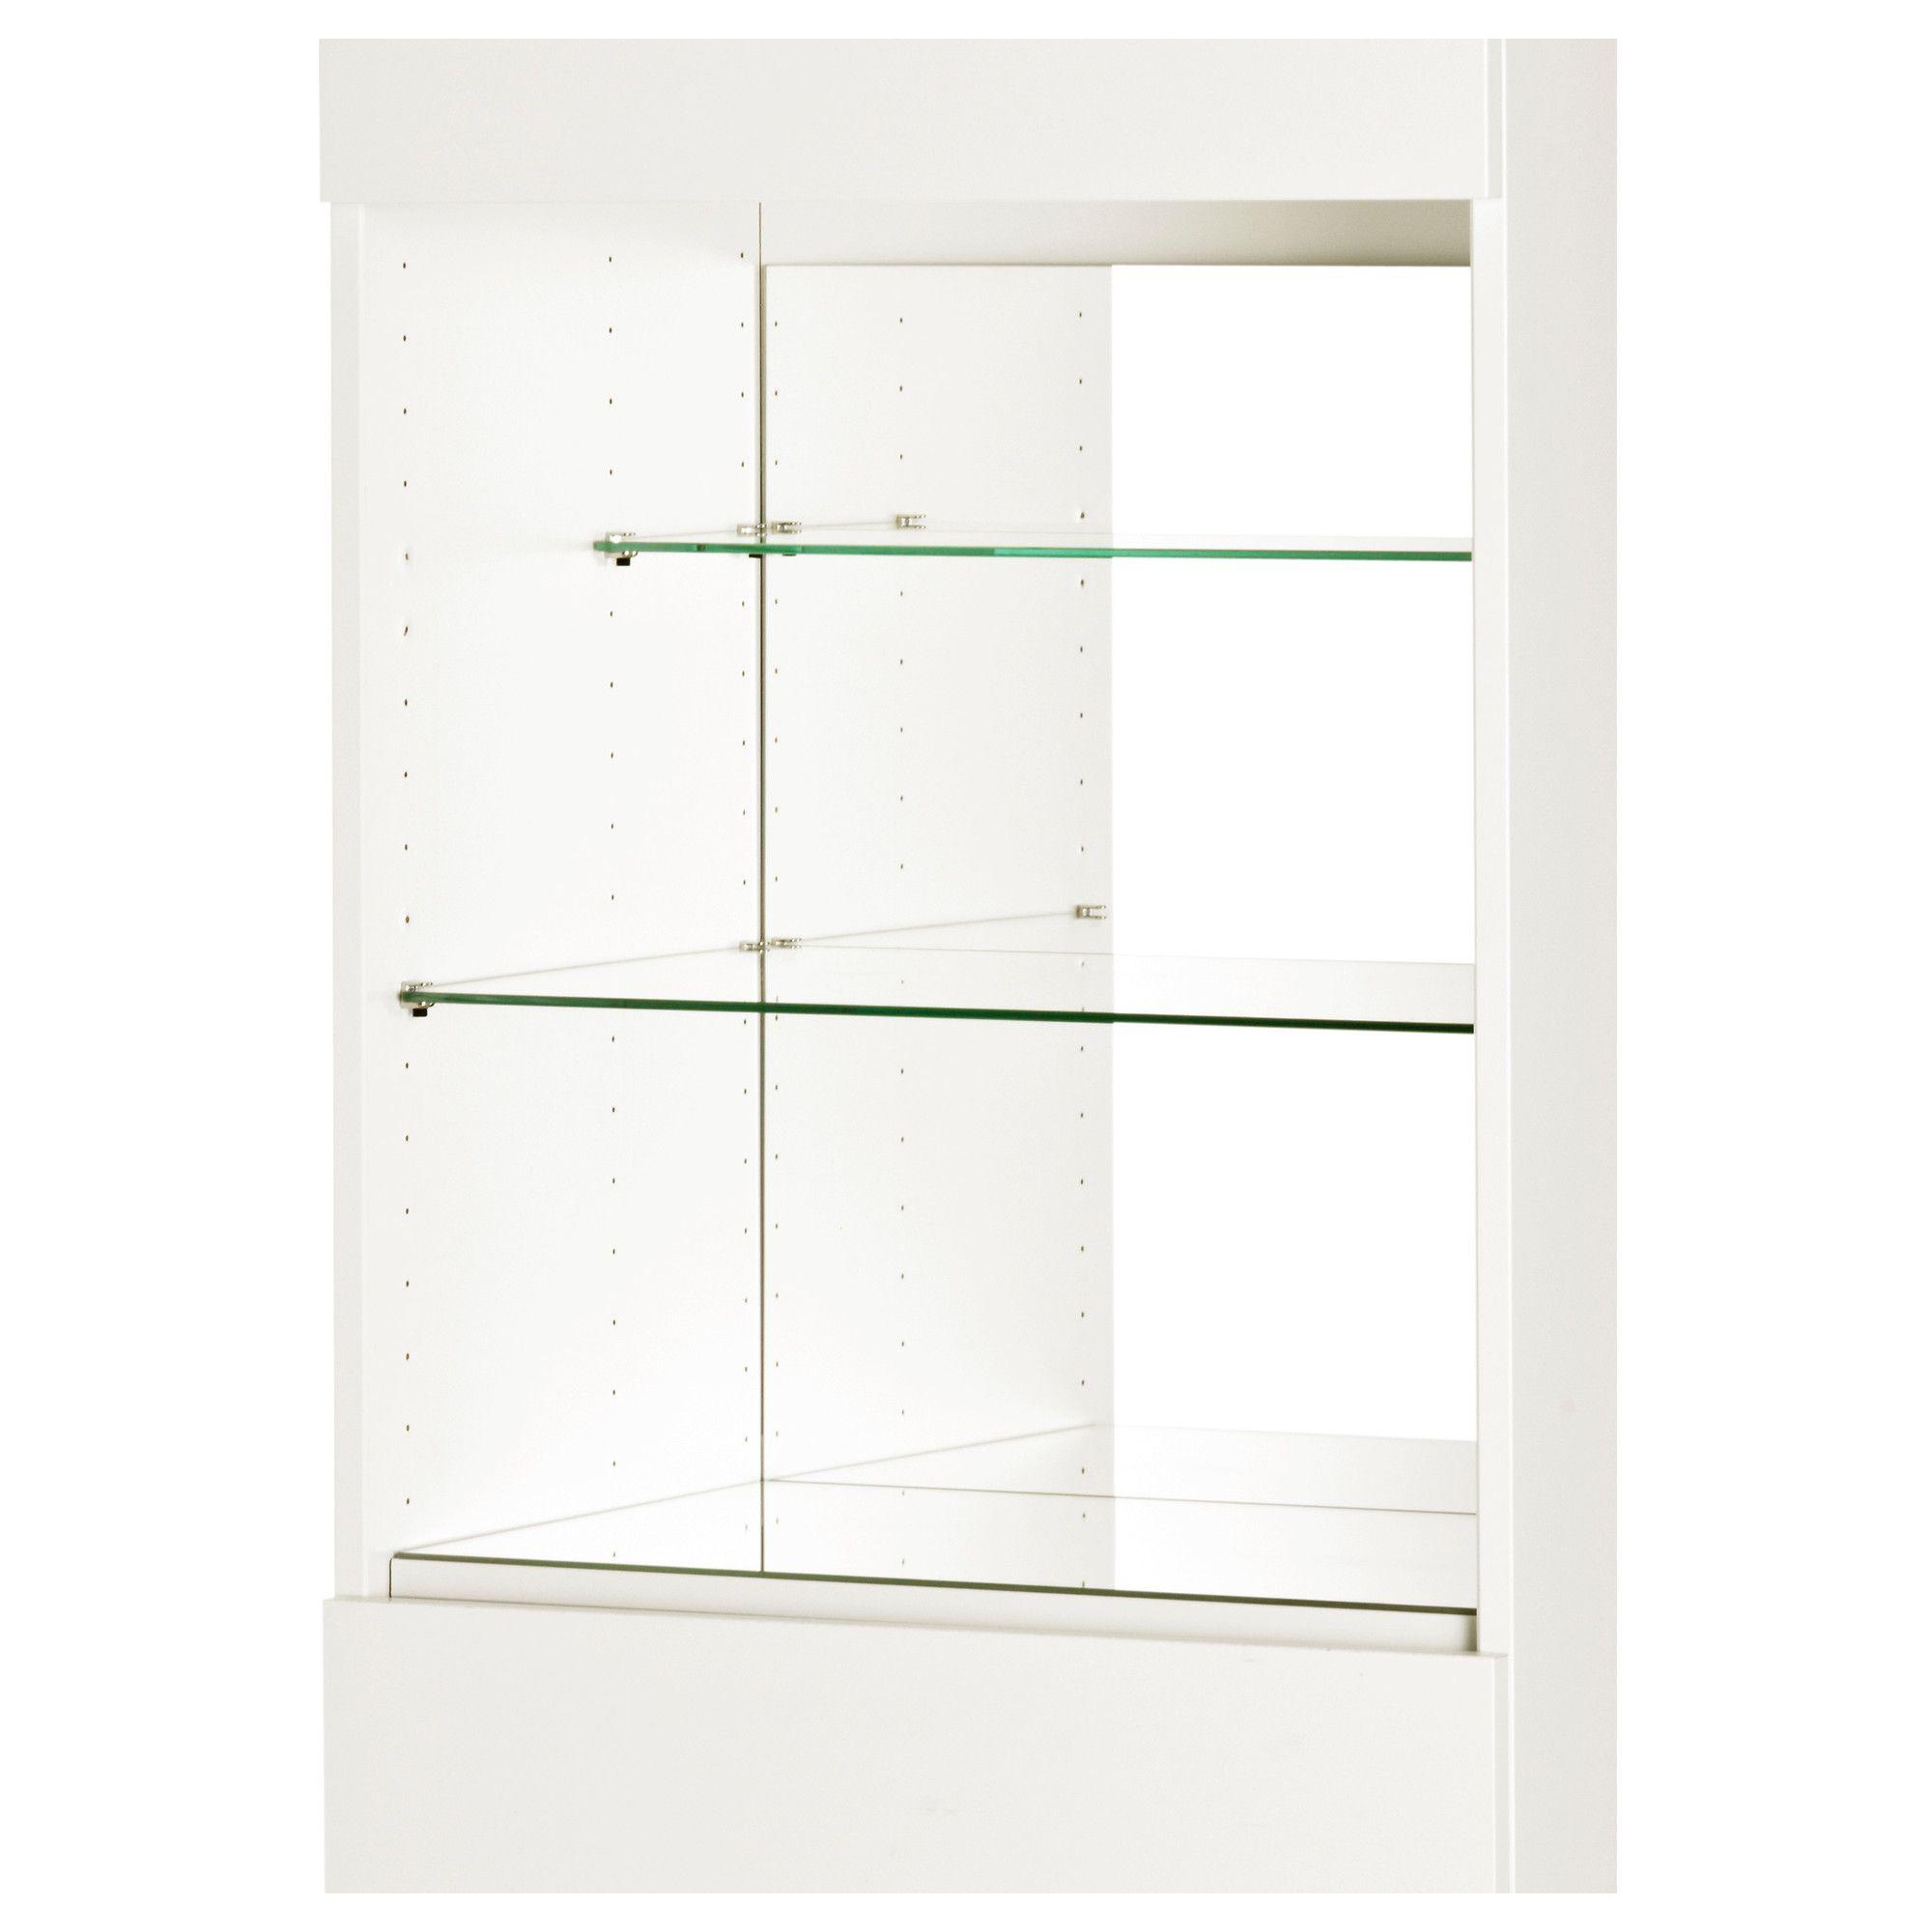 1f42554d1533ad8f03c83cc766ffff0b Frais De Bar De Salon Ikea Concept